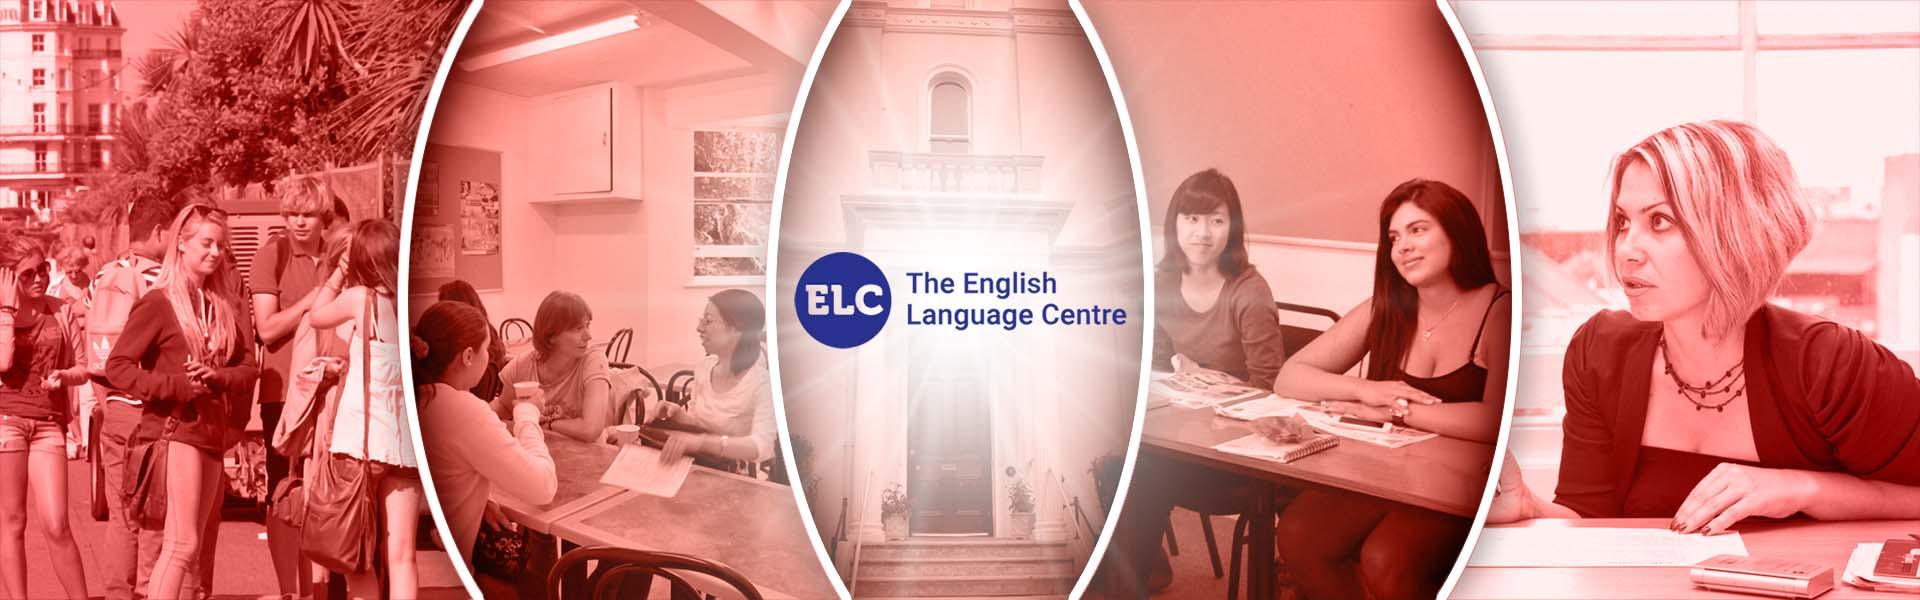 The English Language Center (ELC) Eastbourne